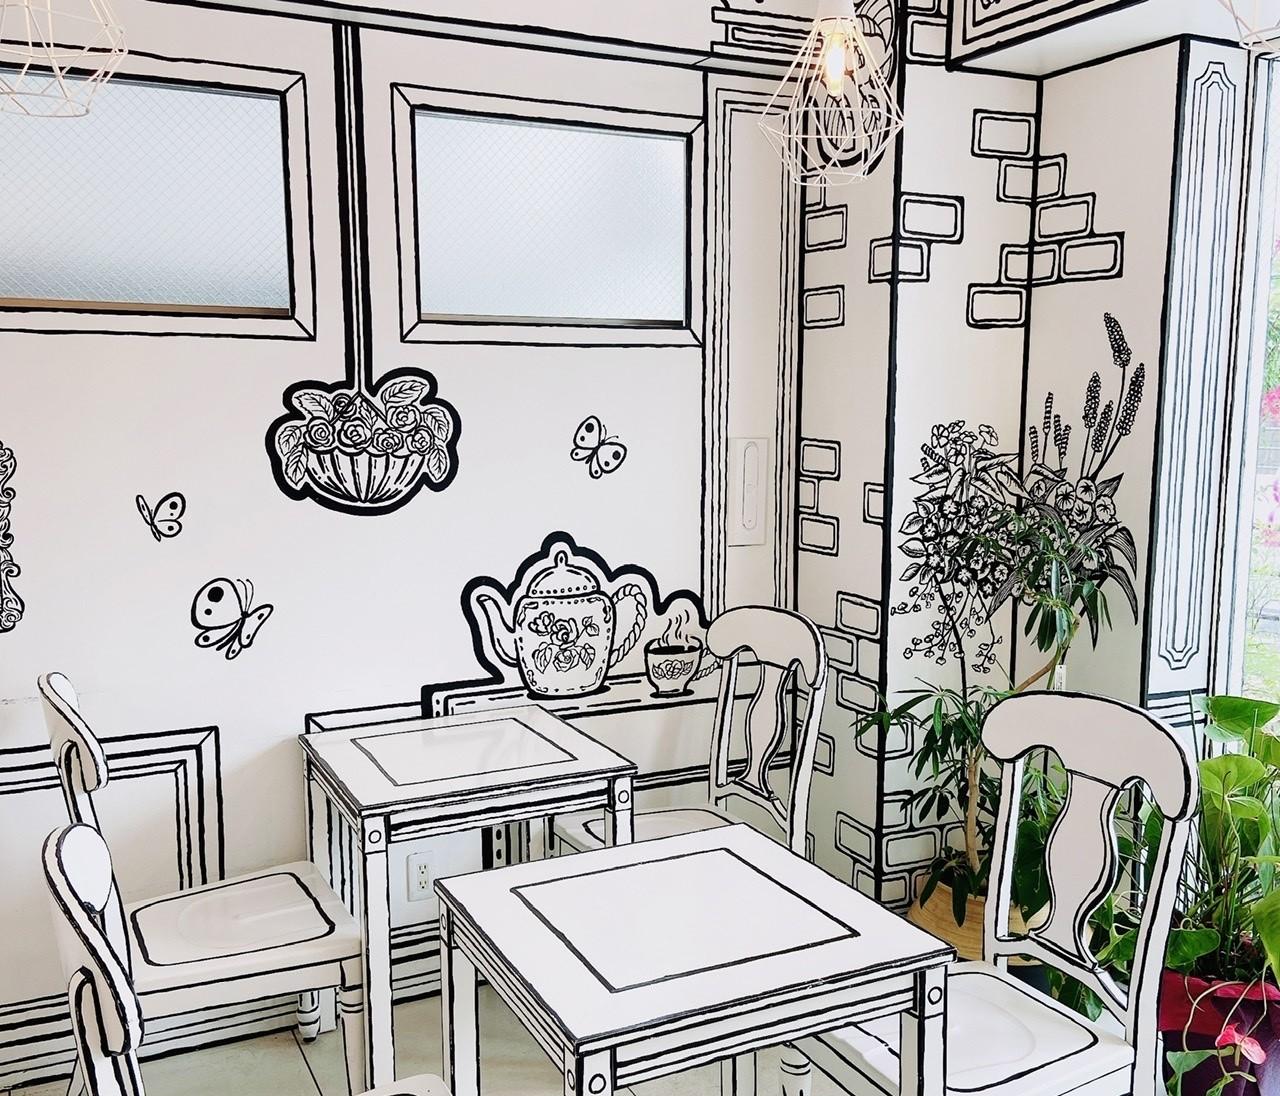 "【SNSで話題の2次元カフェ】まるで""絵本の世界""なインスタ映えでティータイム"